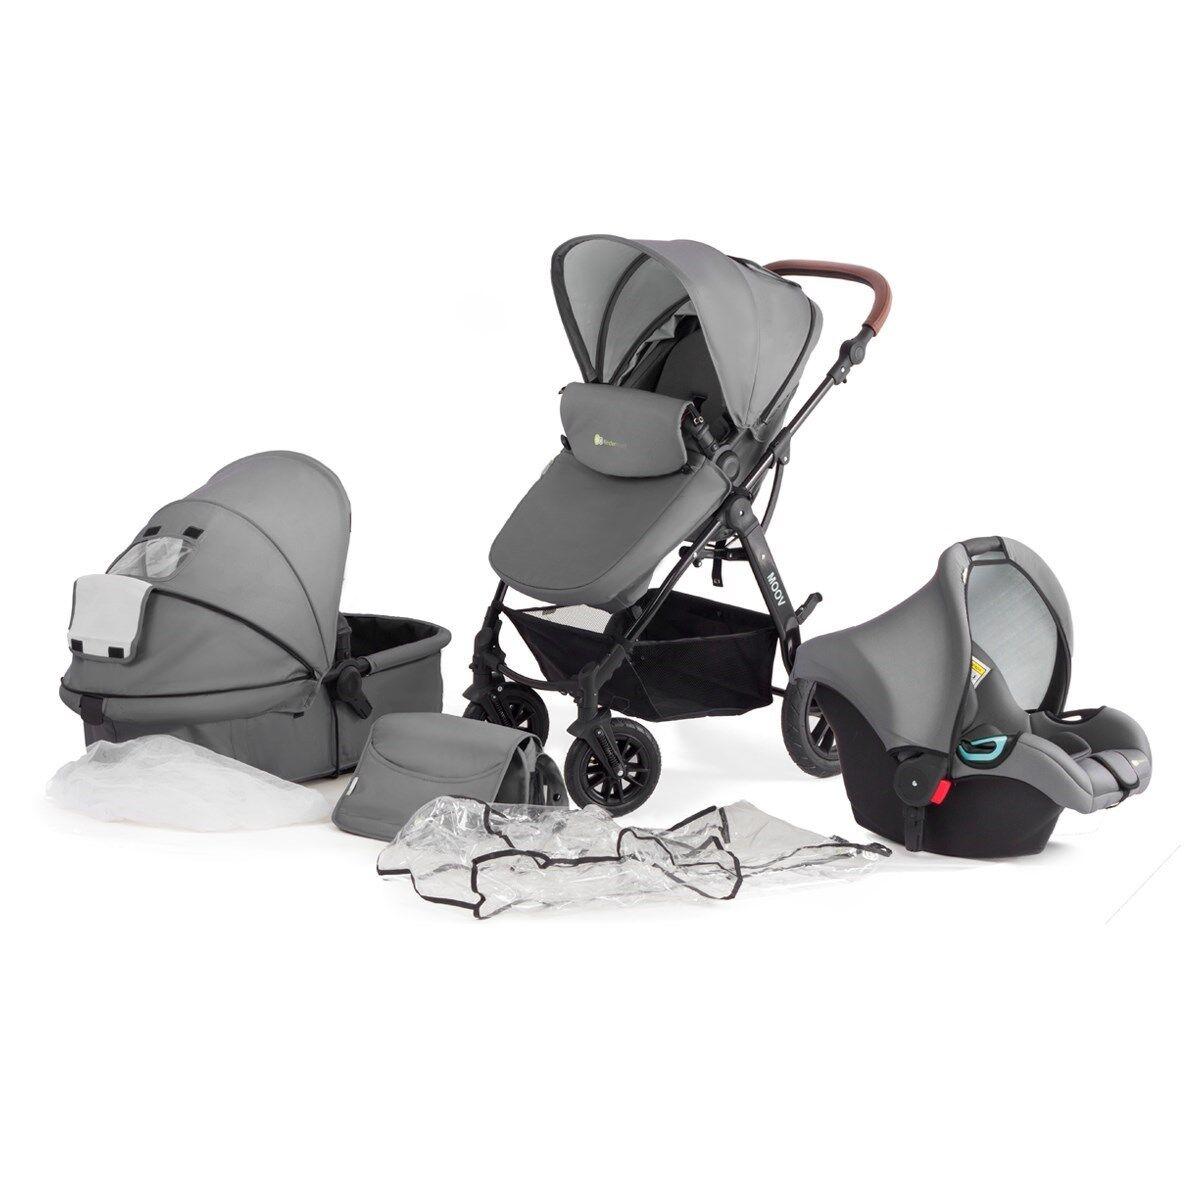 Kombikinderwagen Kinderwagen Babyschale Kinderkraft Moov 3in1 Set Multi grau